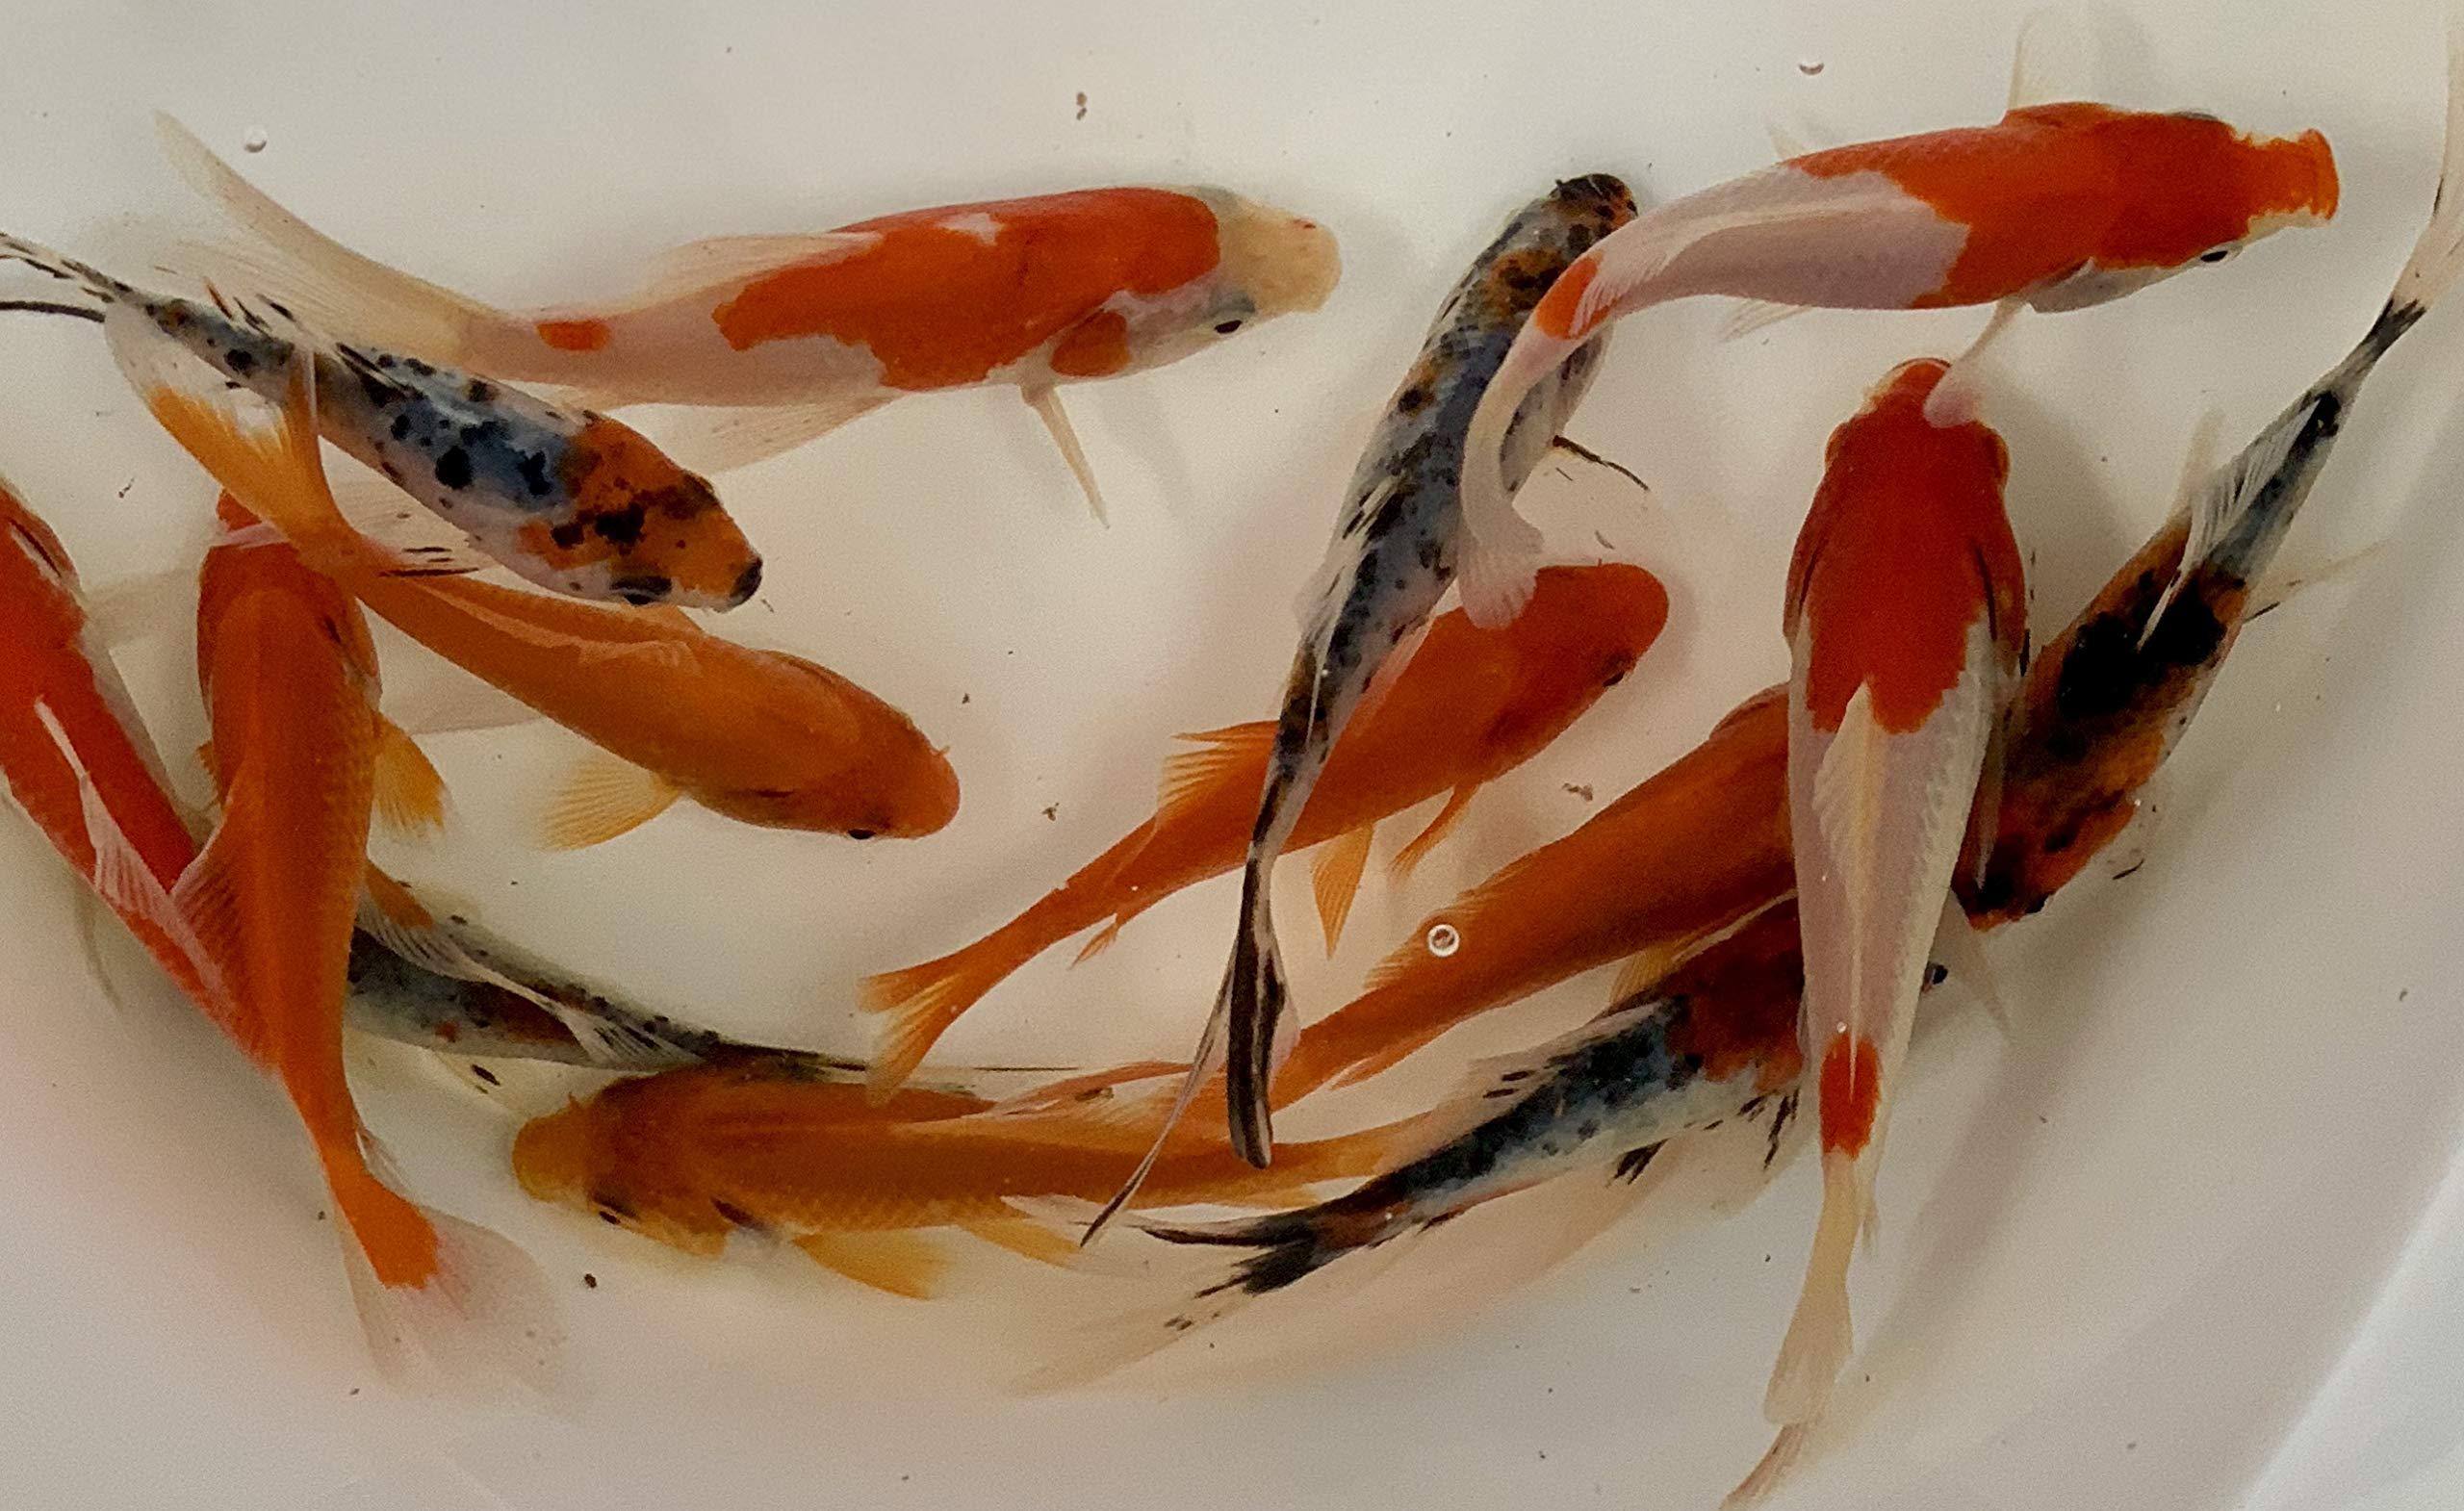 Toledo Goldfish Live Shubunkins, Sarasas & Common Mixture for Pond and Aquariums (3-4'', 24 Fish (8 of Each))